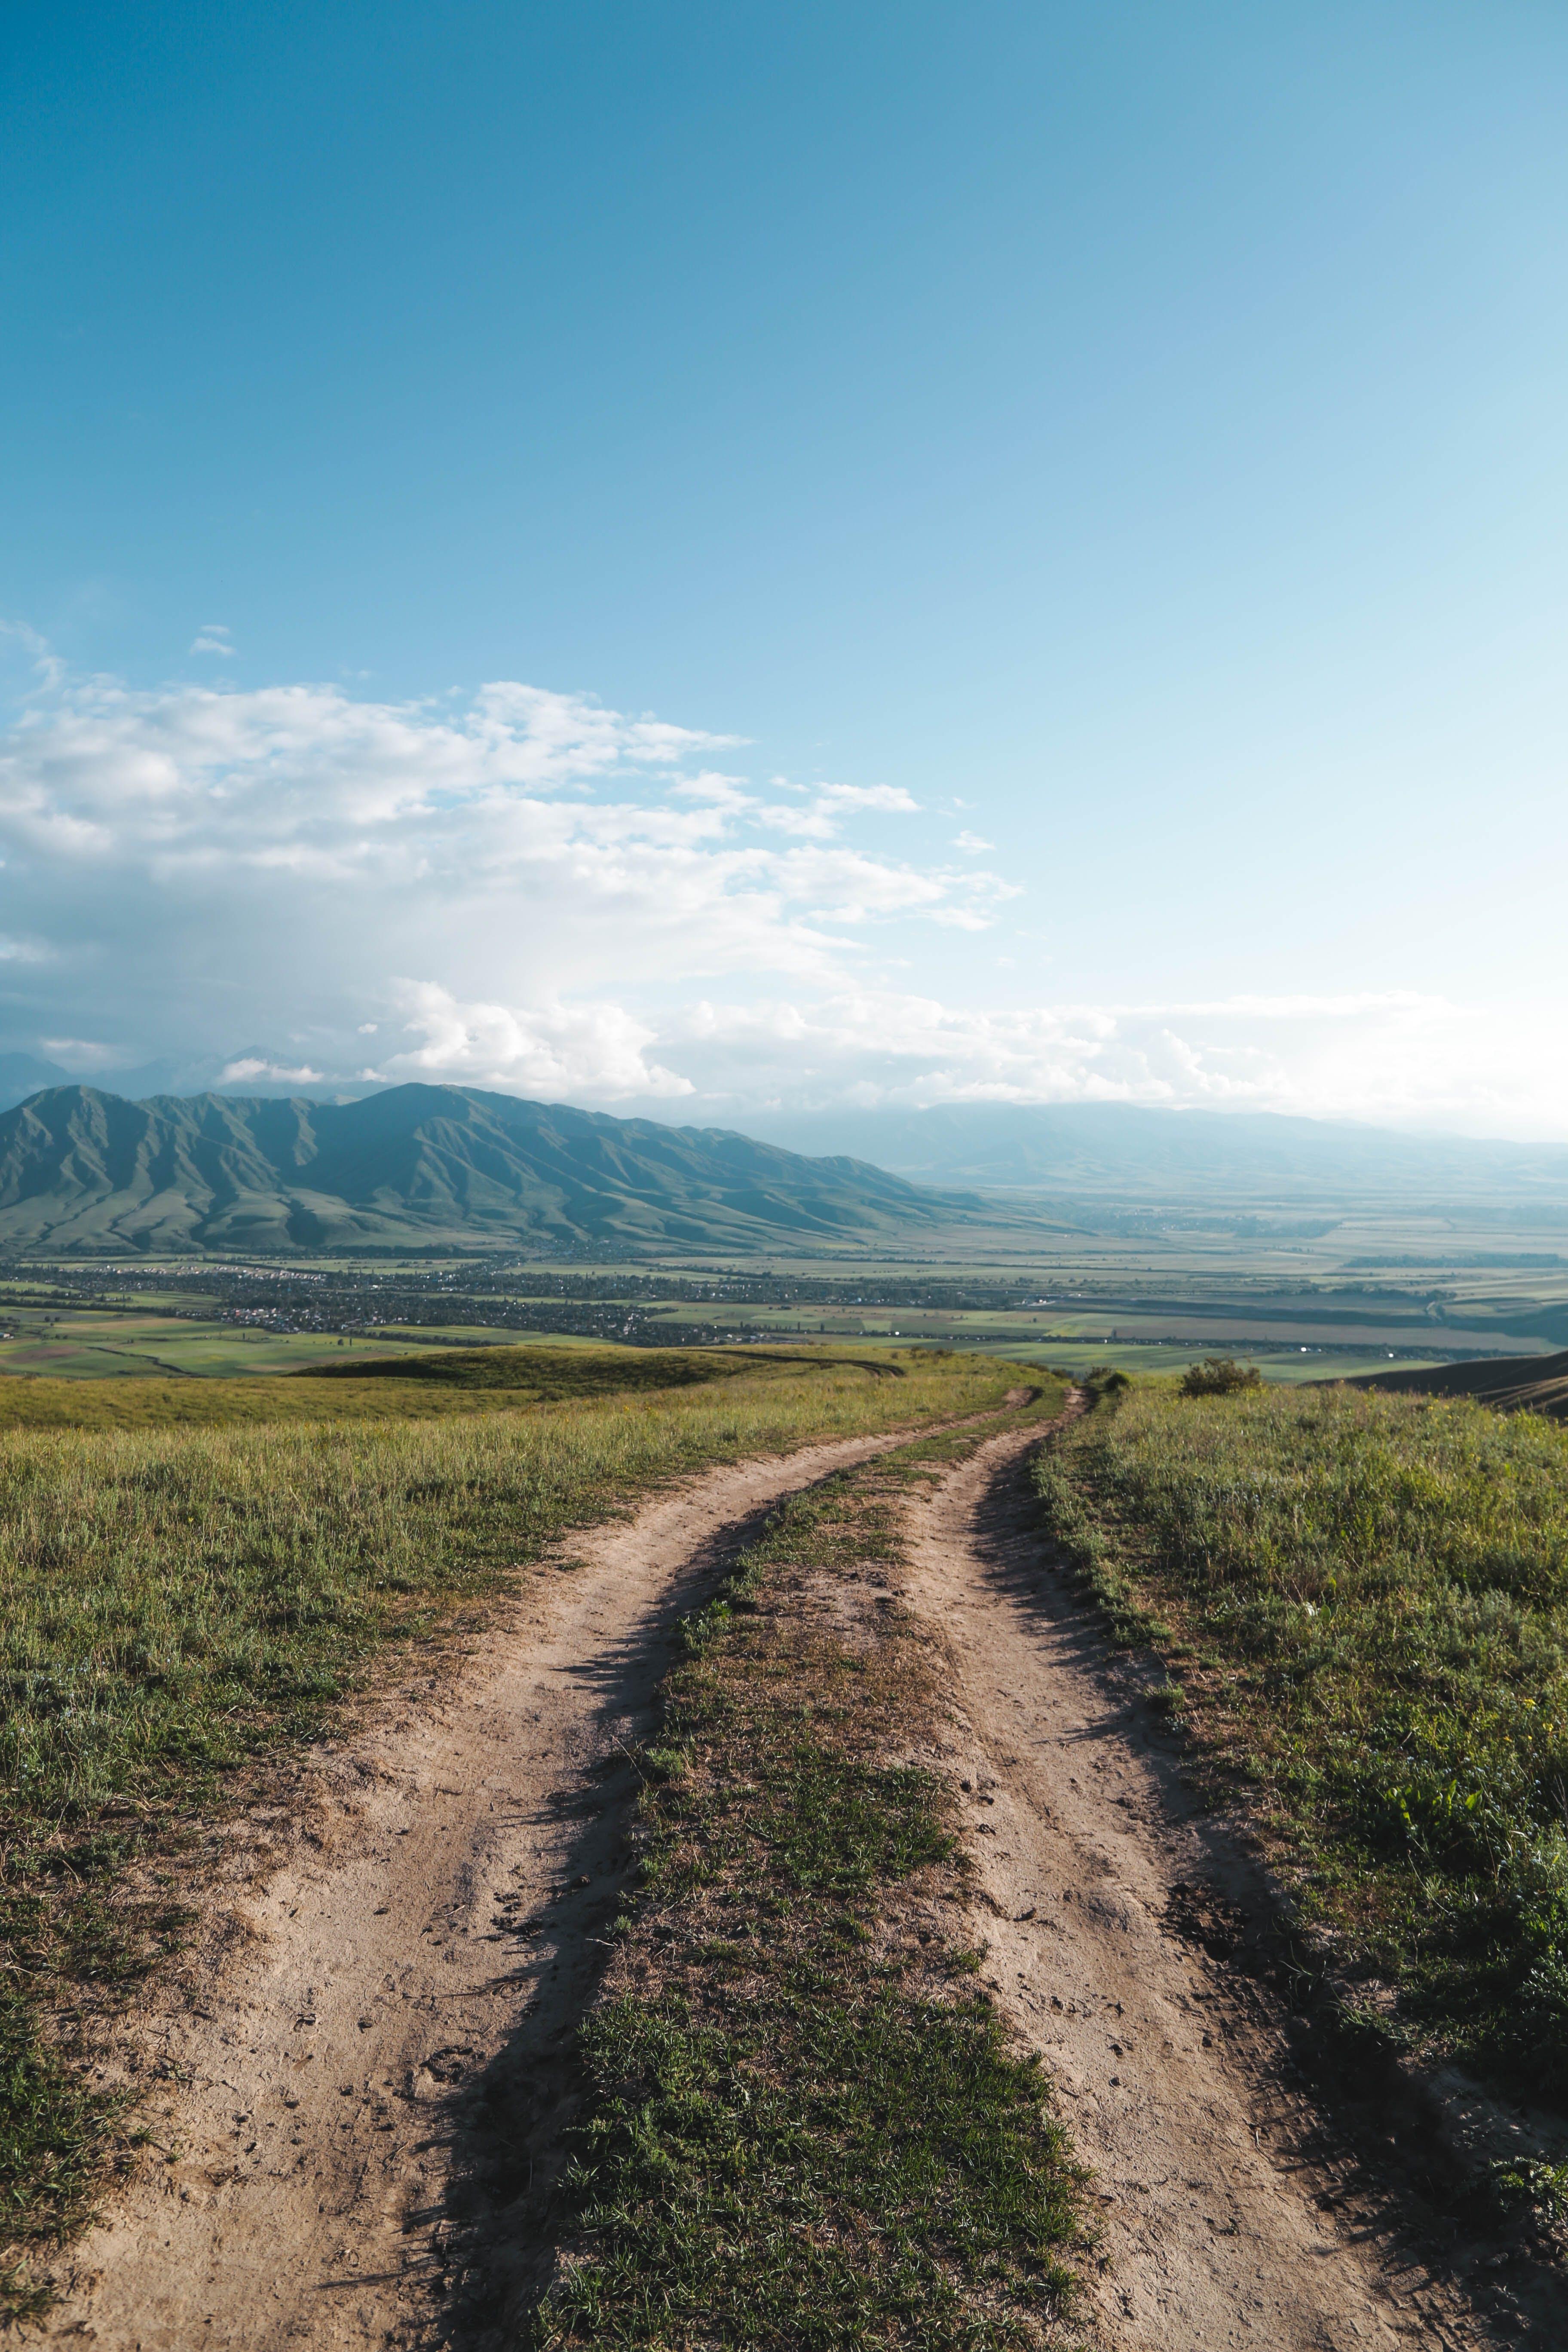 Landscape Photography of Farmland